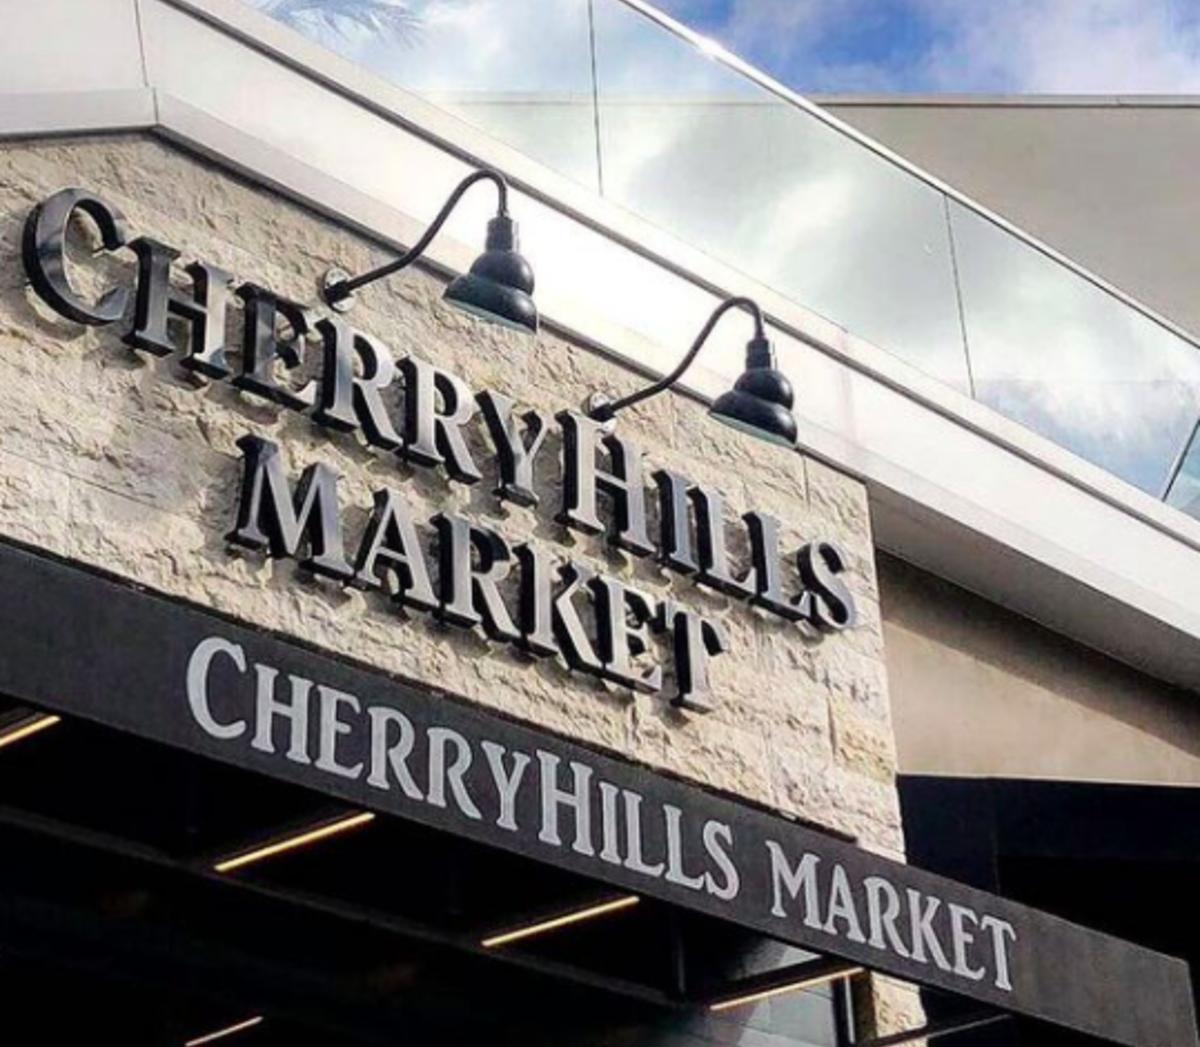 Cherryhills Market in Huntington Beach